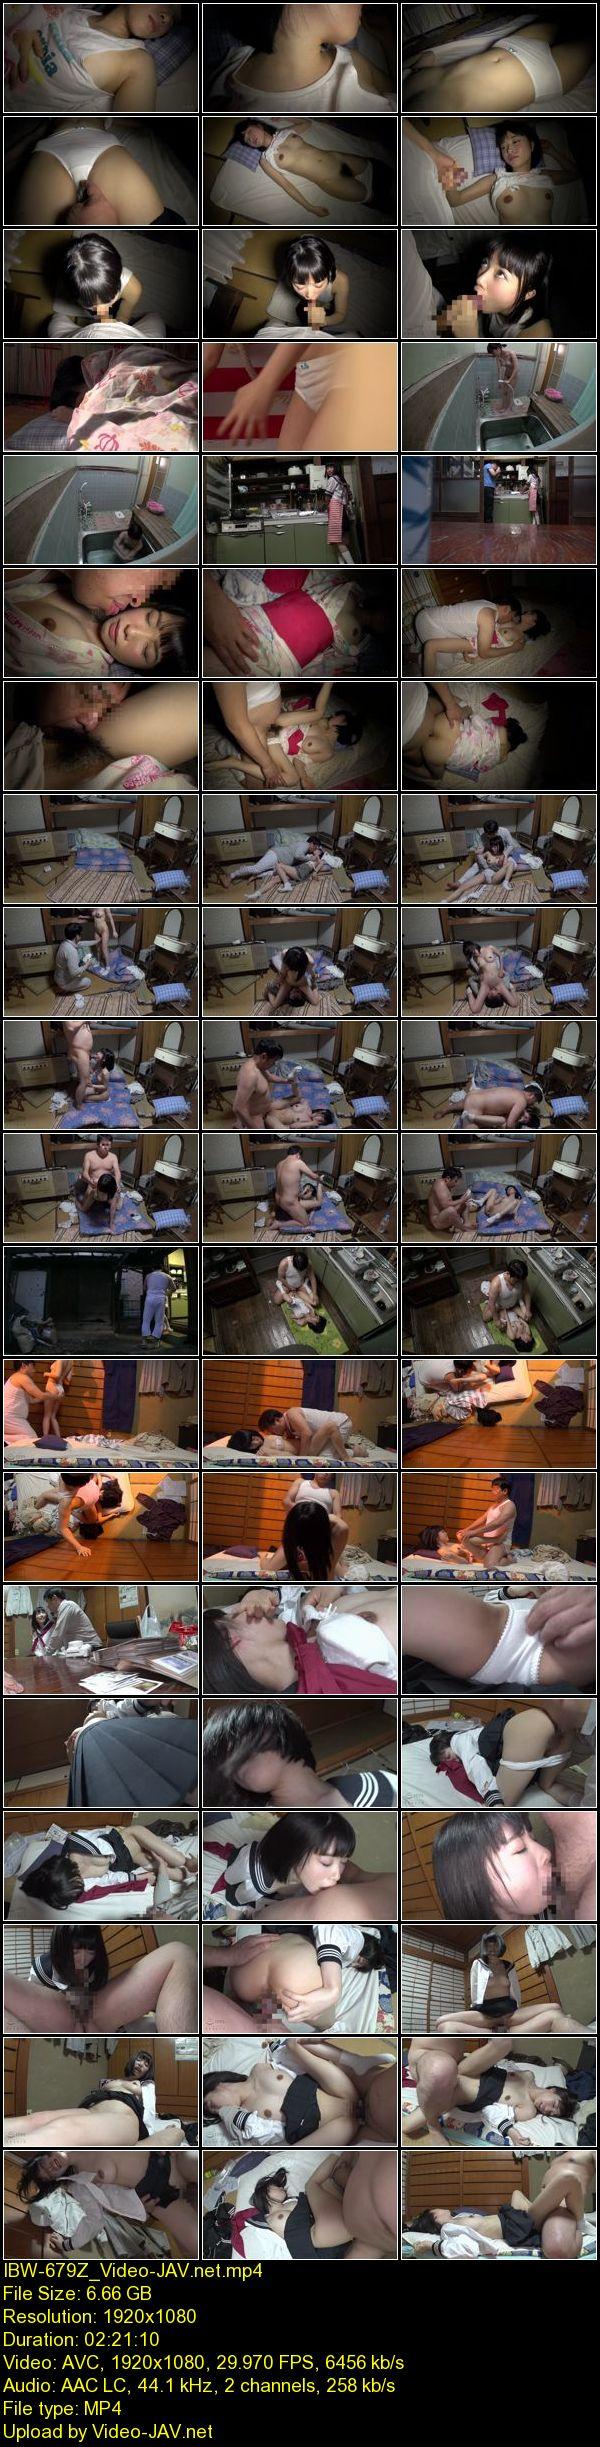 JAV Download Kotori Morino [IBW 679Z] 父親に犯され続ける娘の近親相姦映像 もりの小鳥 企画 Fetish 2018 05 25